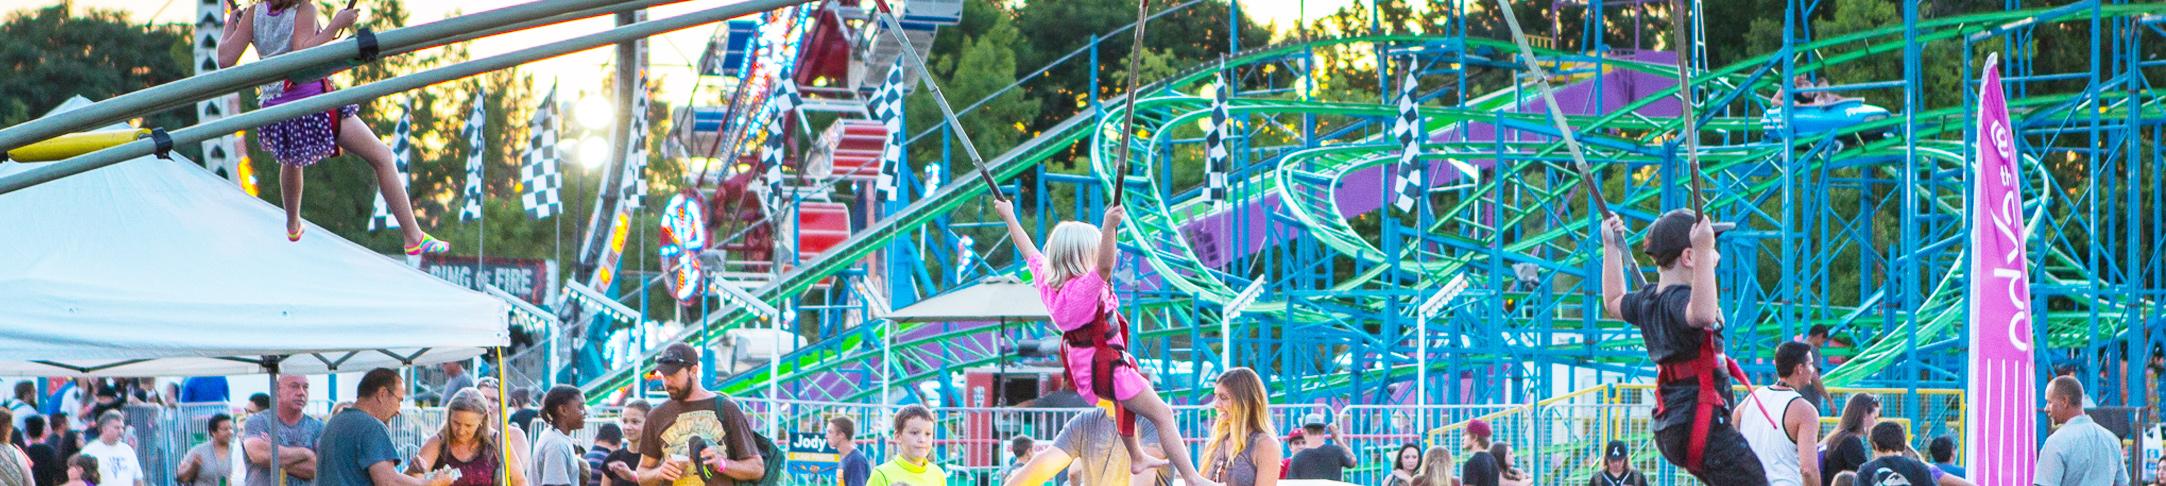 Jackson County Fair Rides